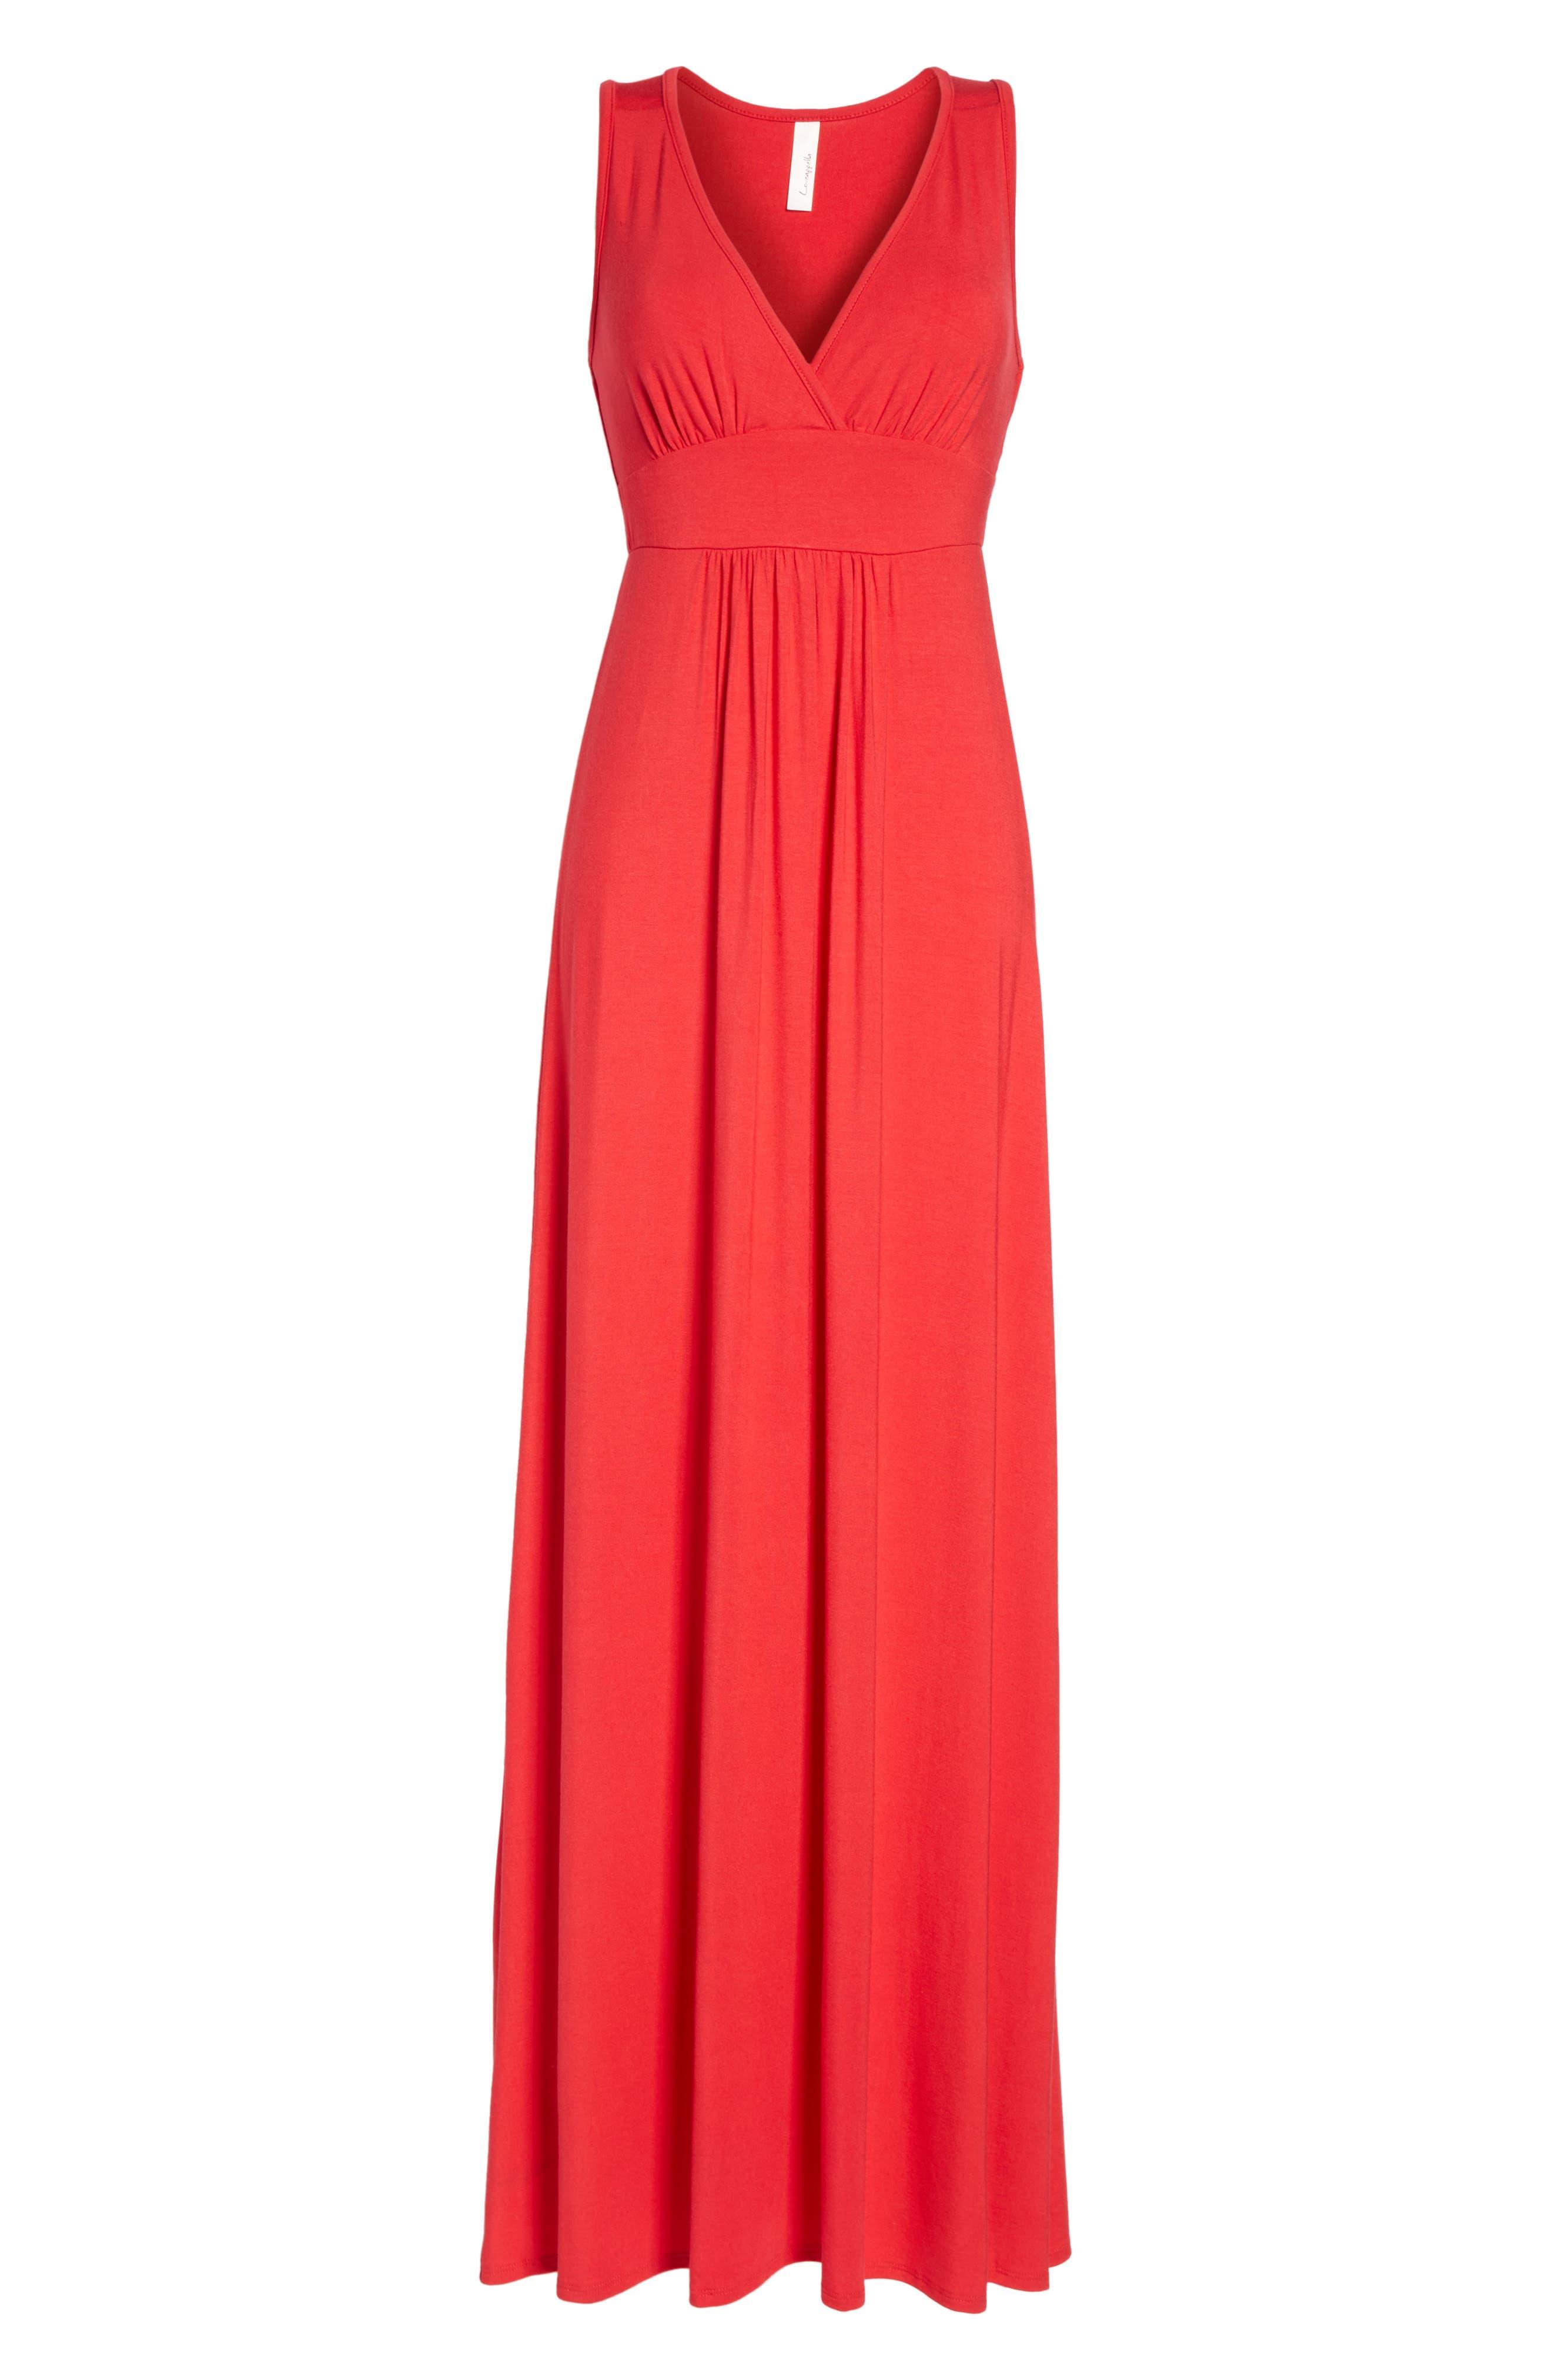 Loveappella V-Neck Jersey Maxi Dress, Red